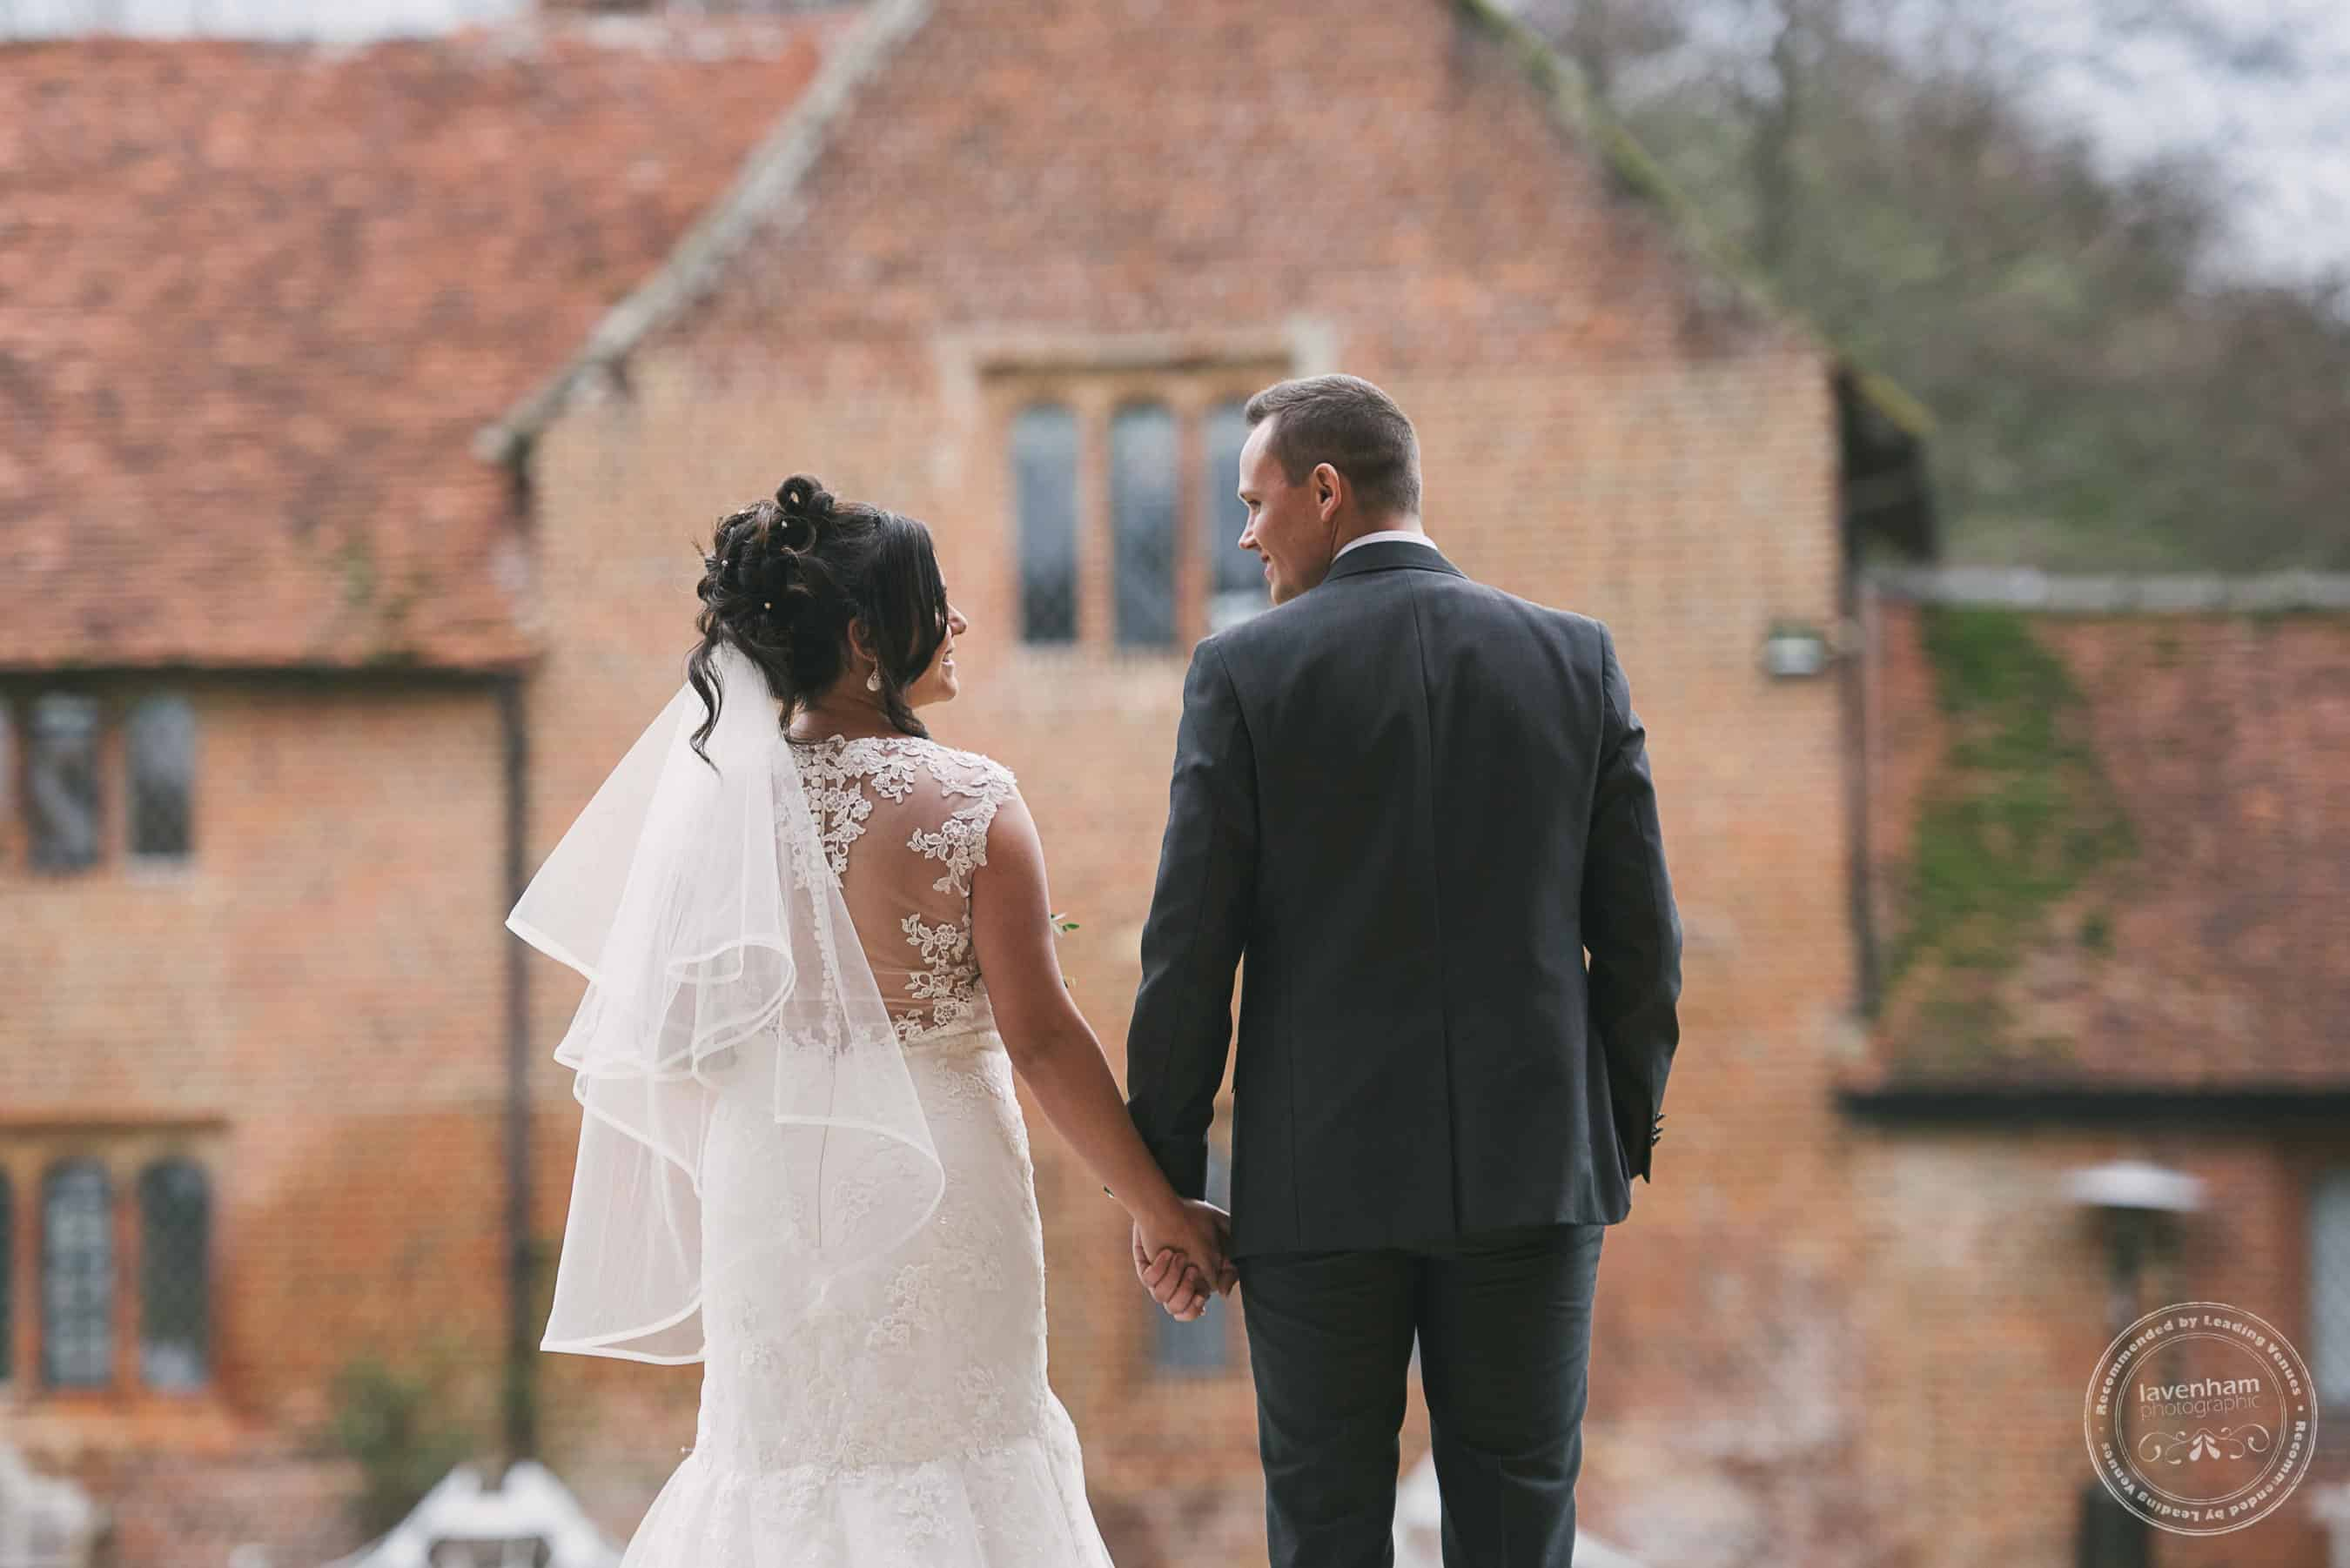 251118 Leez Priory Wedding Photography by Lavenham Photographic 090